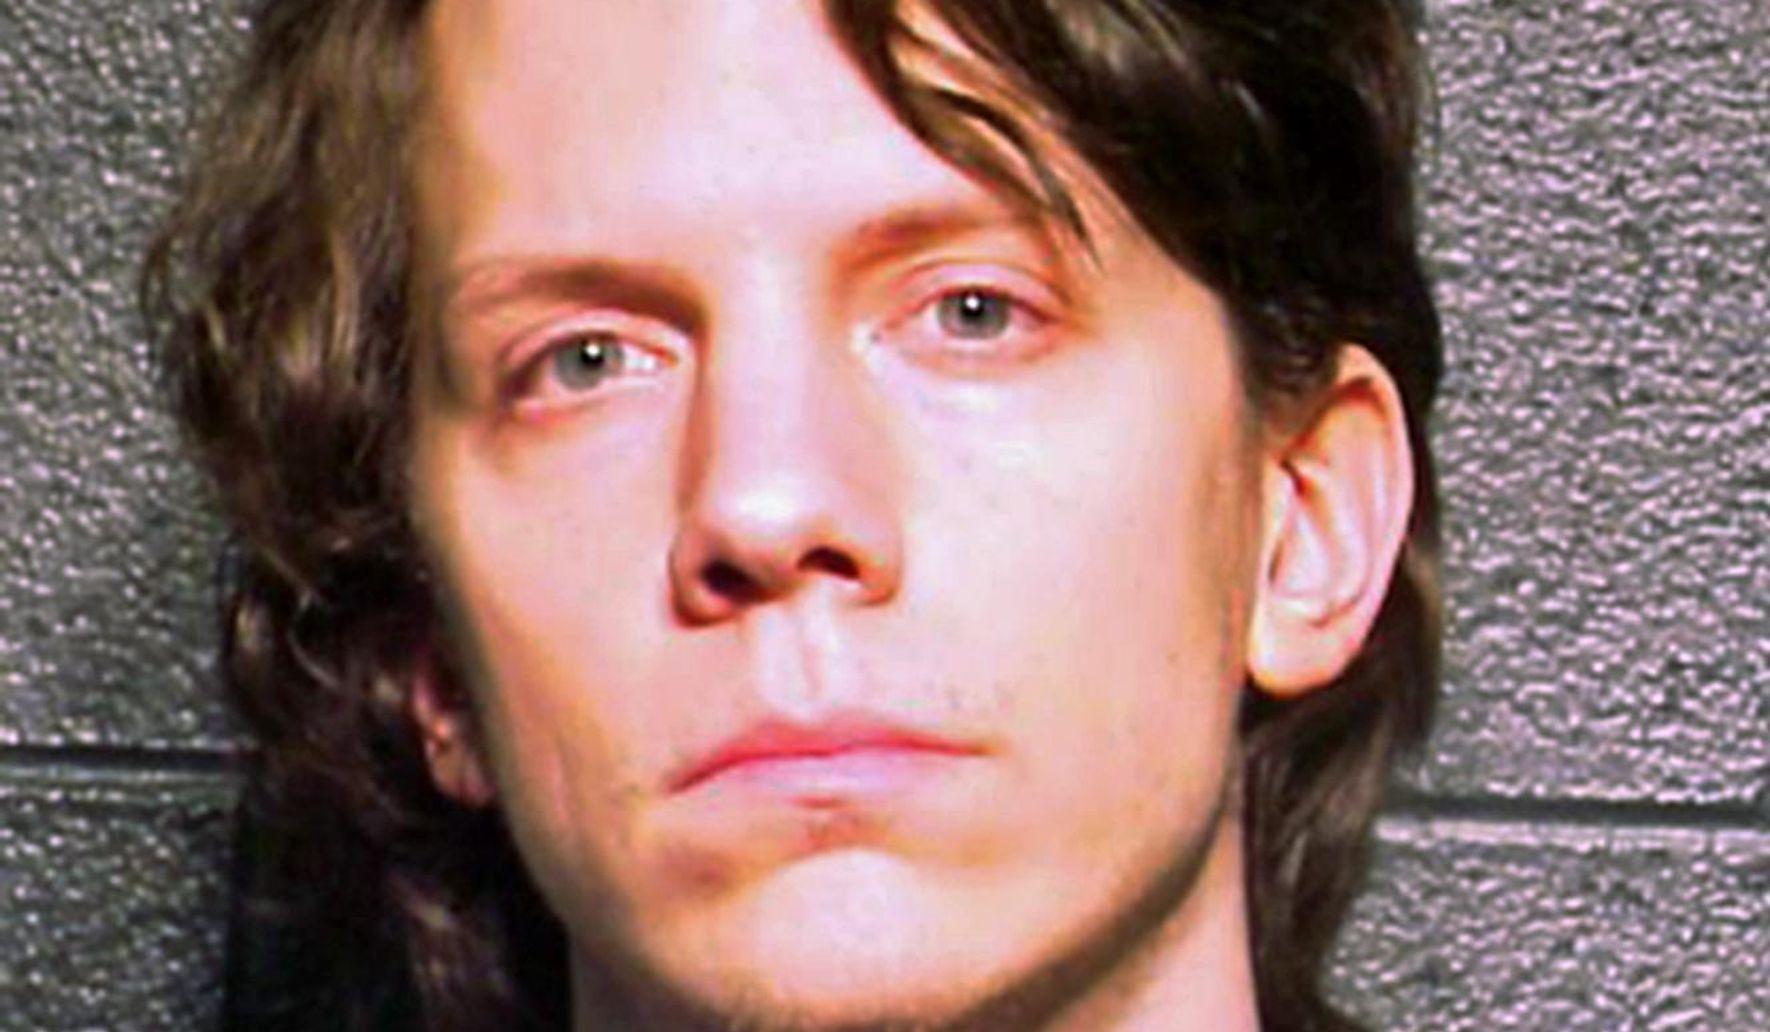 Jeremy Hammond, jailed computer hacker, held in contempt over WikiLeak